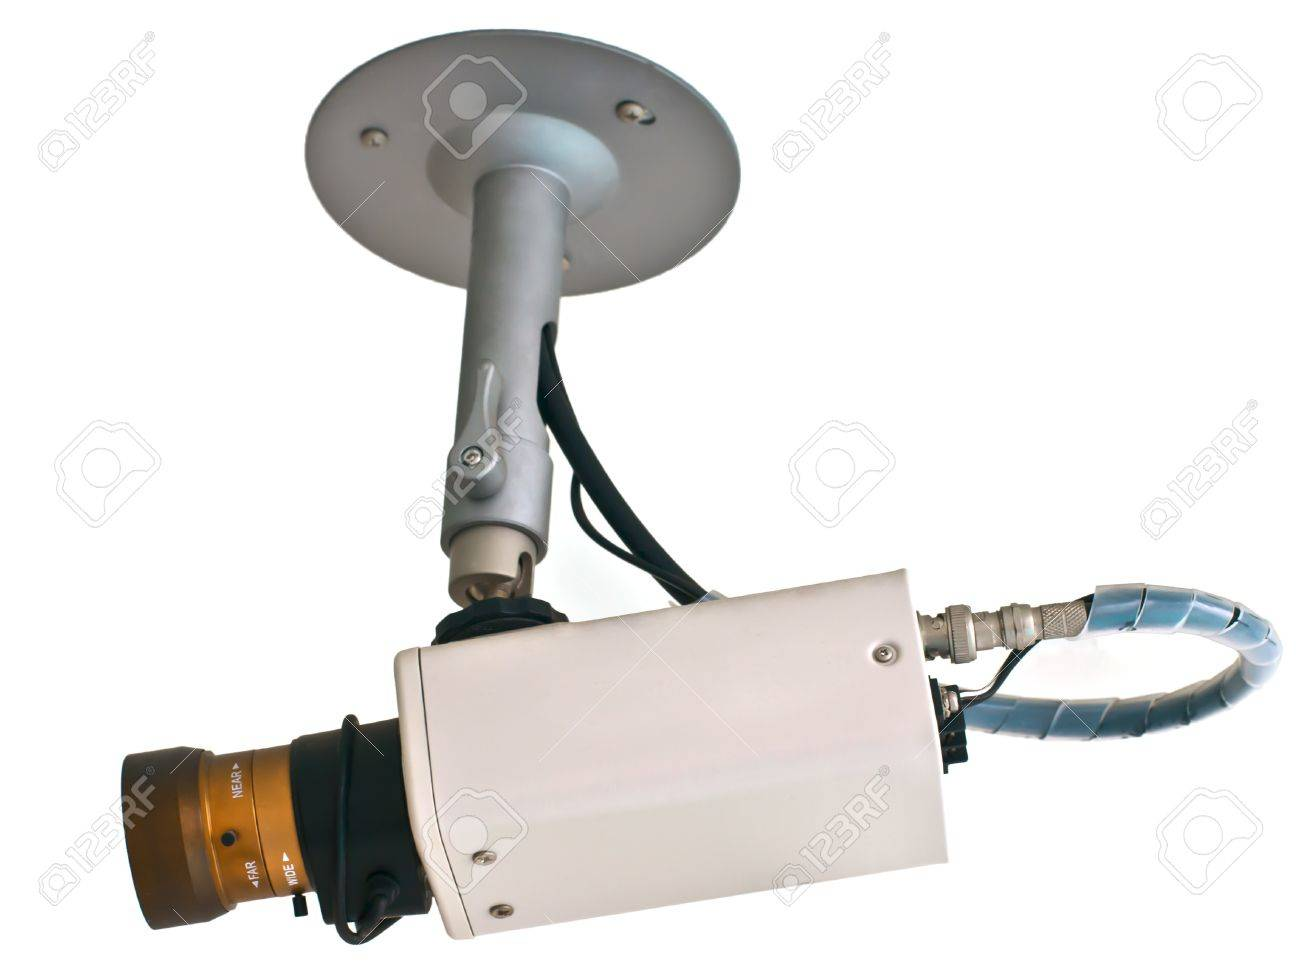 CCTV security camera isolated on white Stock Photo - 14122105